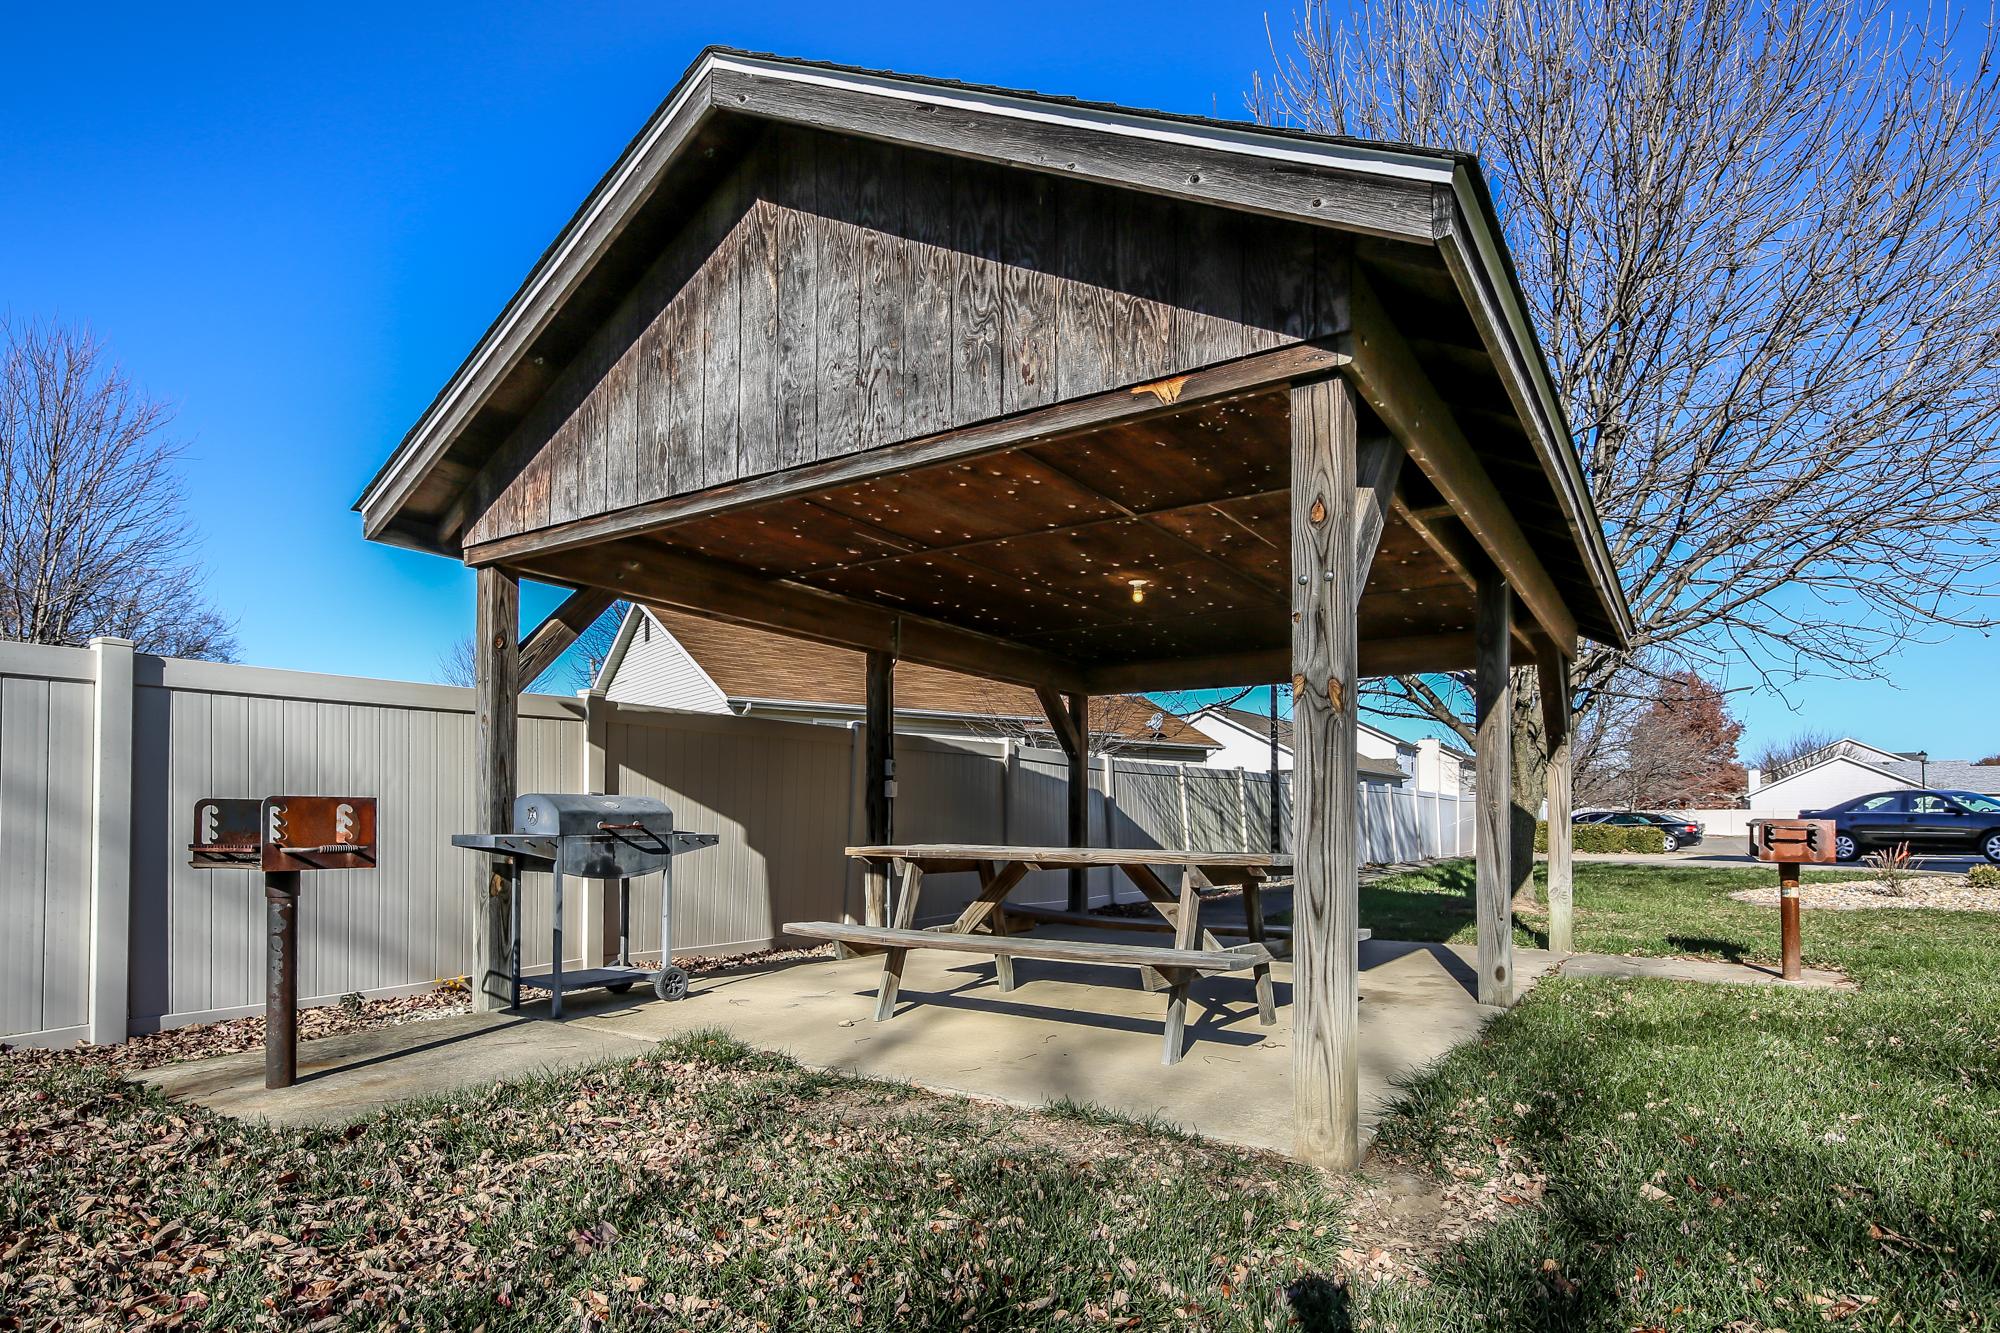 Apartments-For-Rent-Near-Scott-AFB-O'Fallon-Illinois-5.jpg